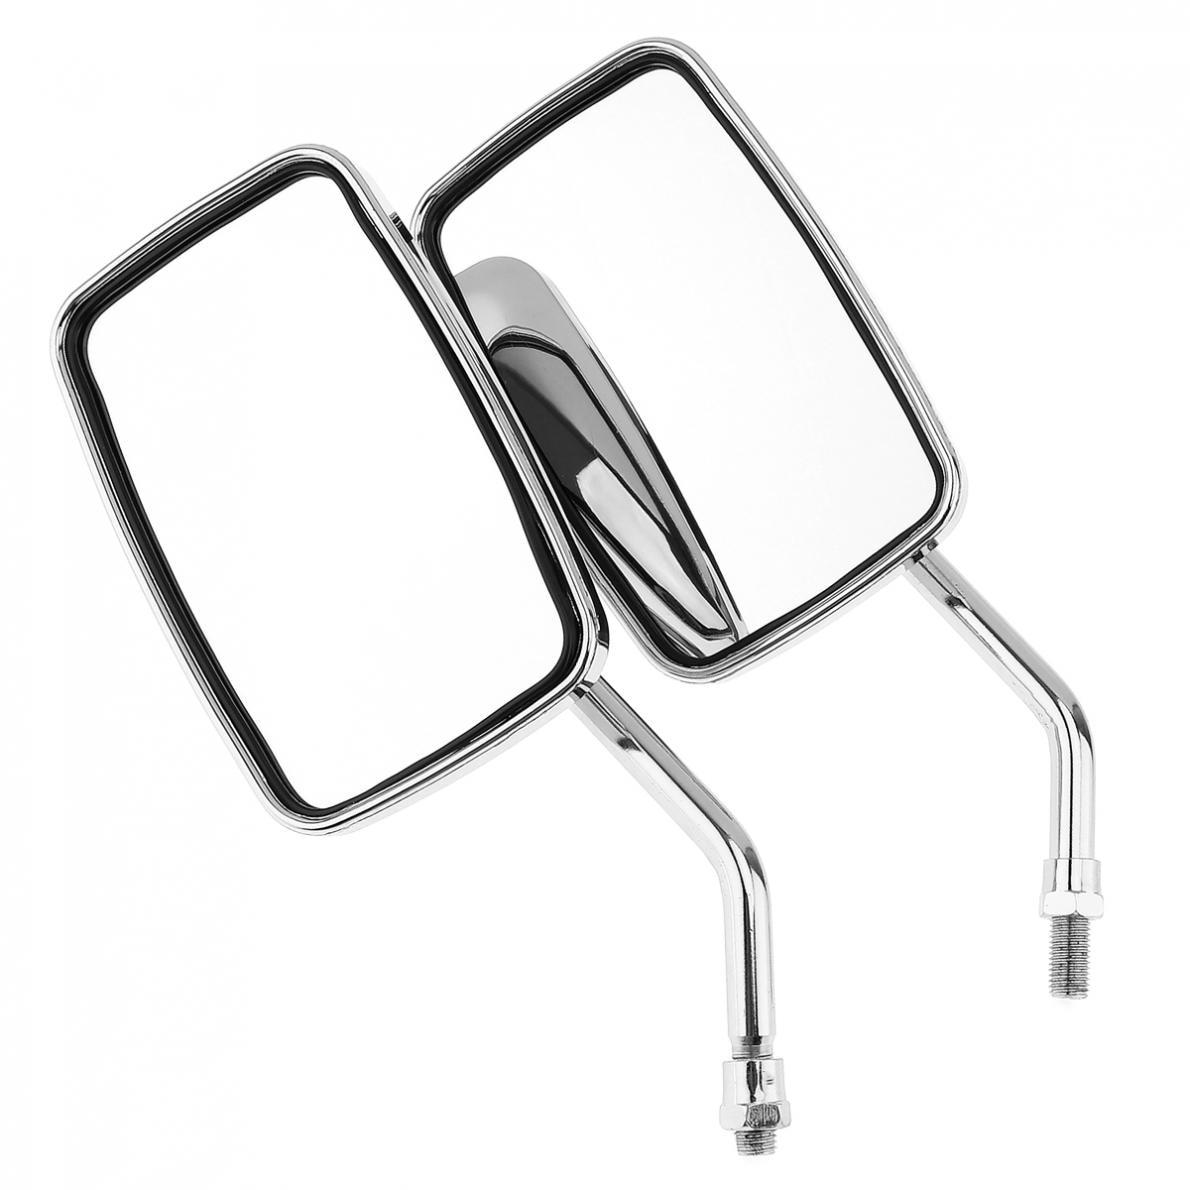 2 STÜCKE Motorrad Spiegel 10mm Roller Bike Rückspiegel Universal Electrombile Rückseite Spiegel